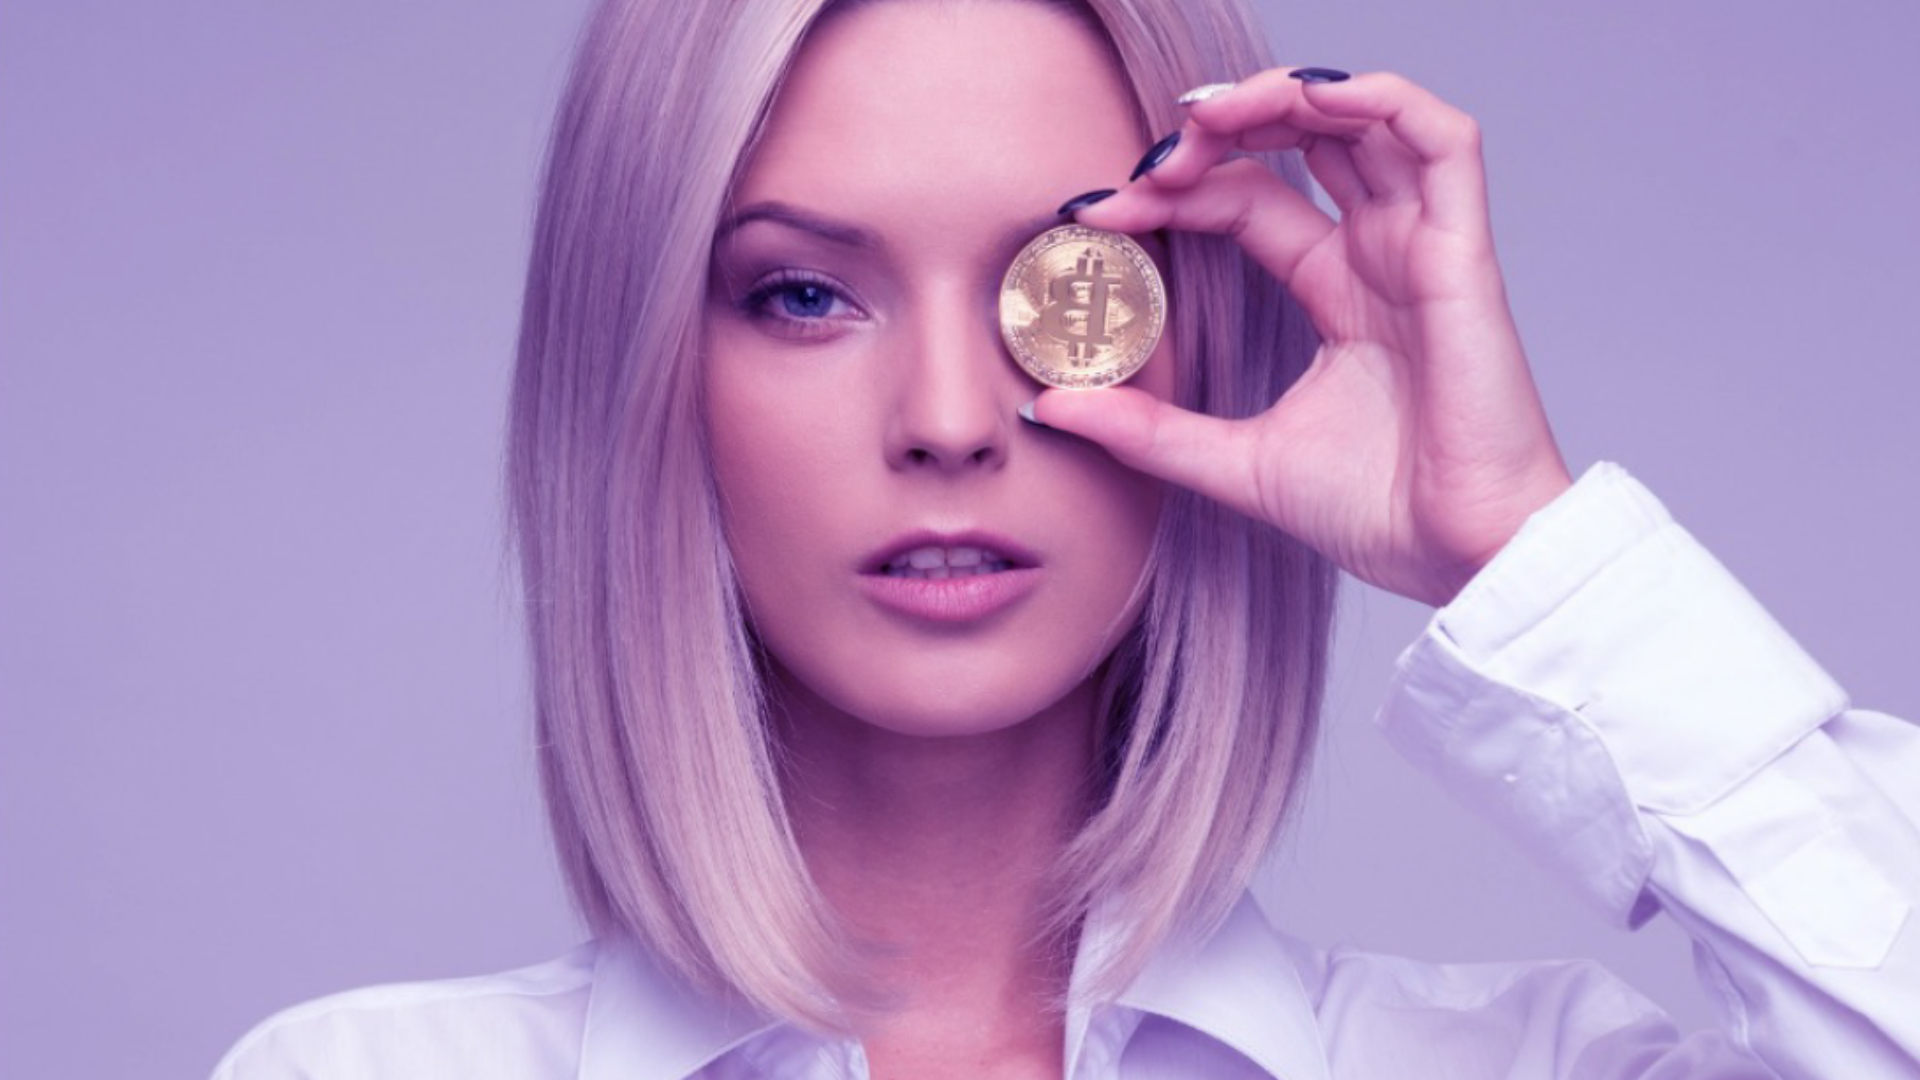 Let's talk money: Ways to monetize your immersive digital experiences